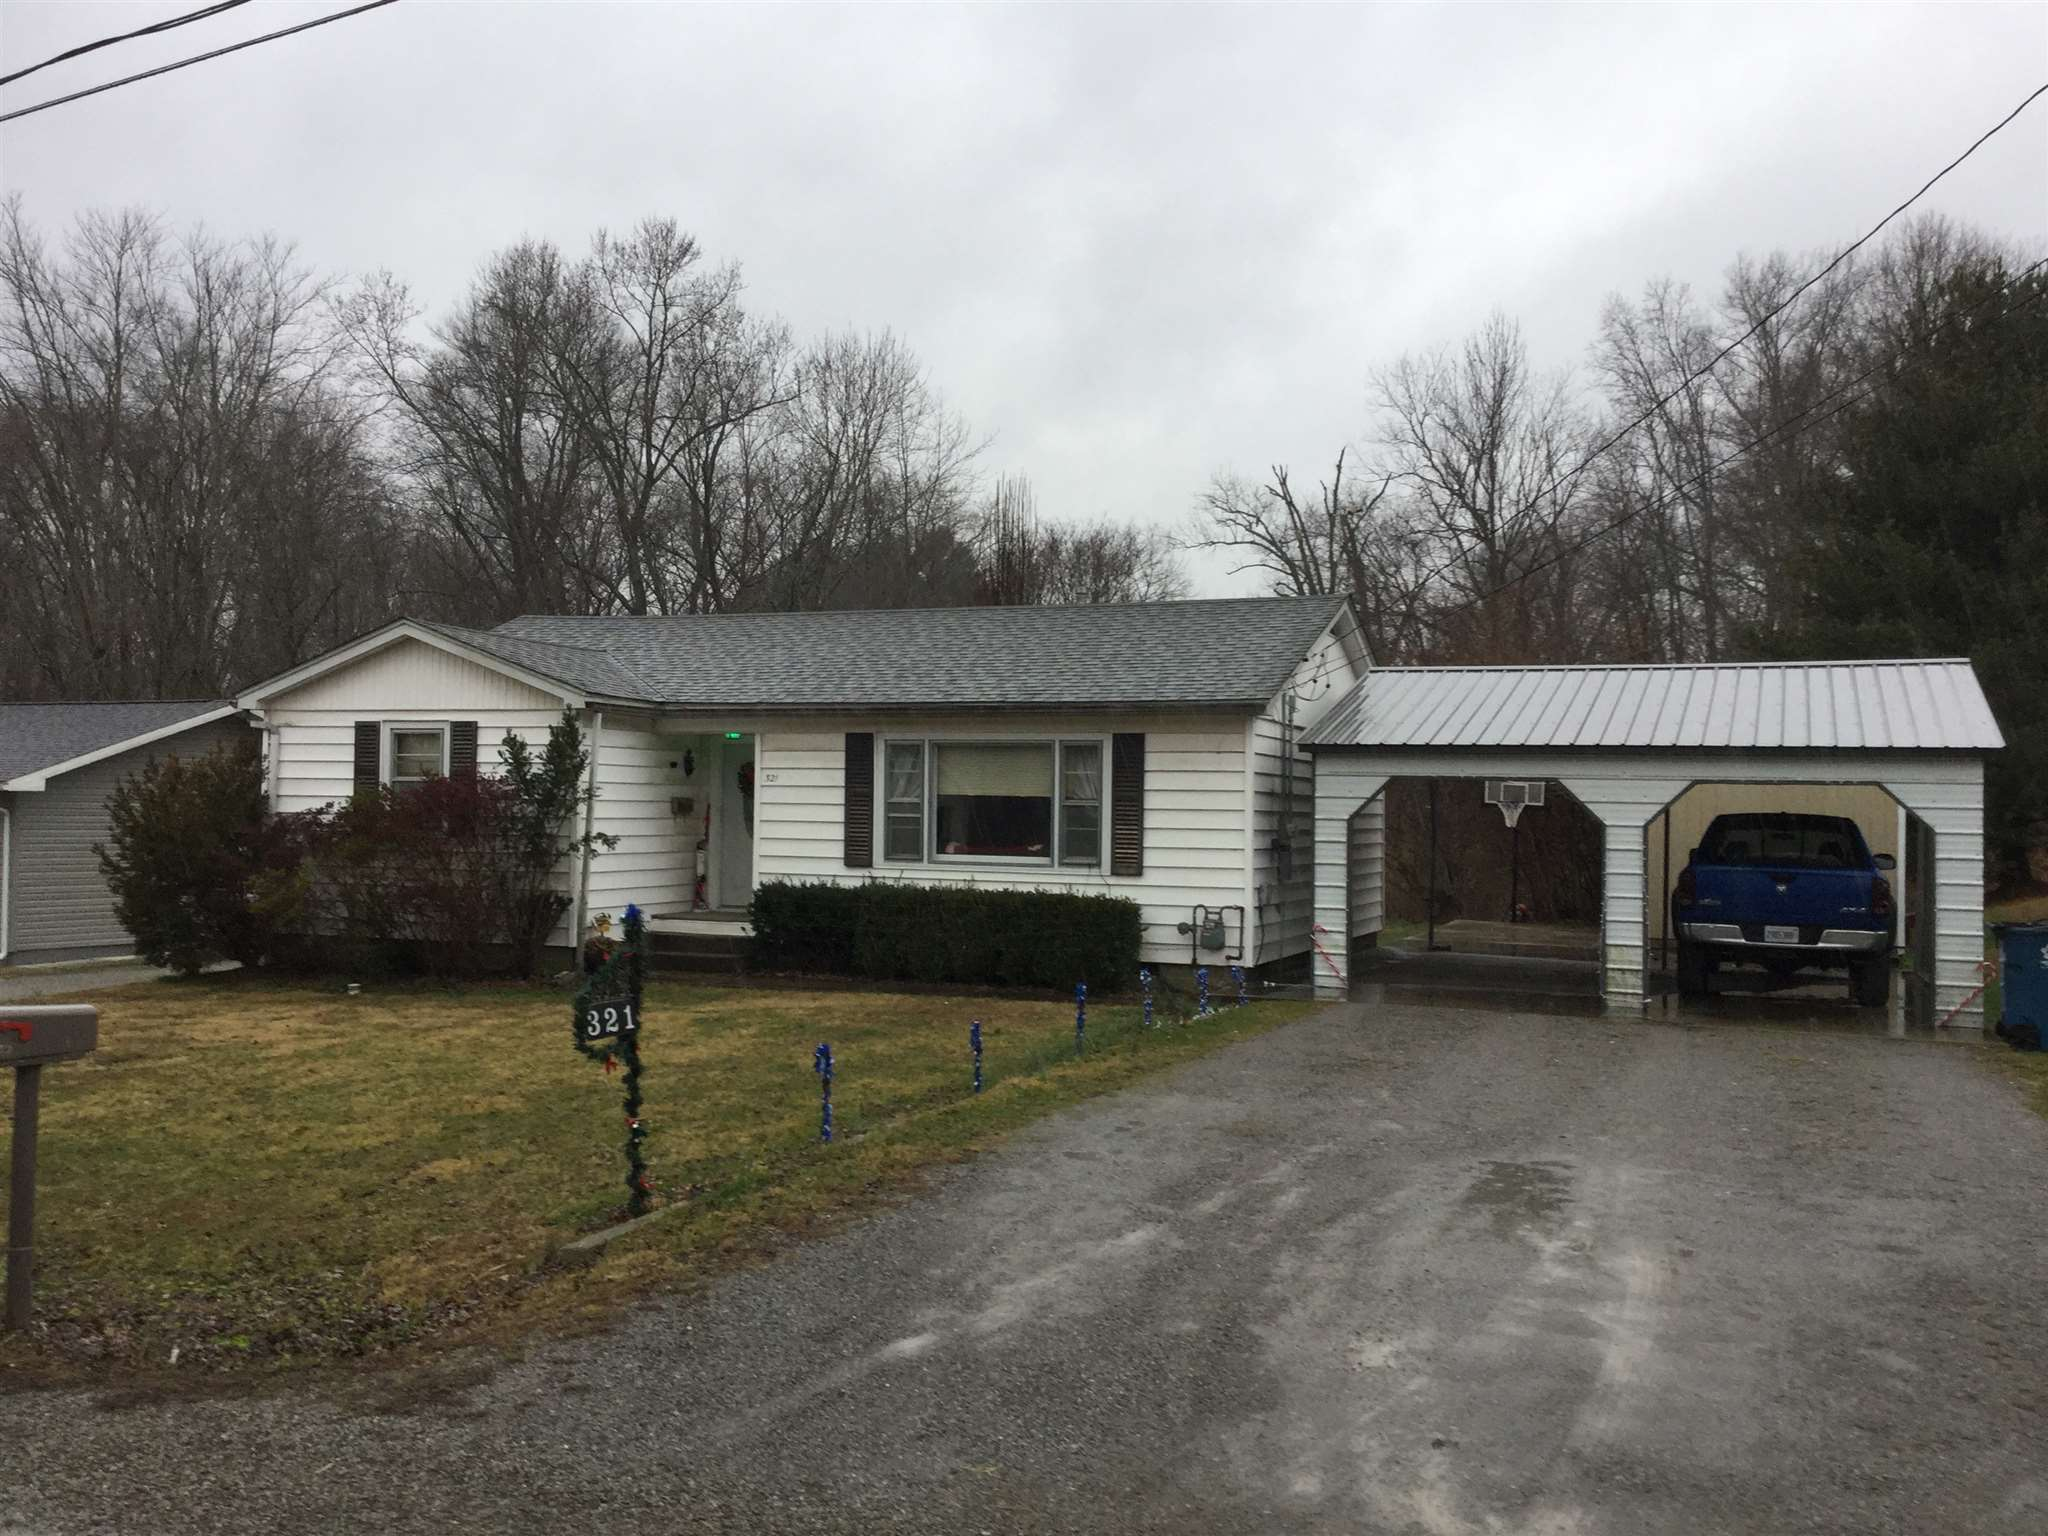 321 S ORANGE Property Photo - Jonesboro, IL real estate listing